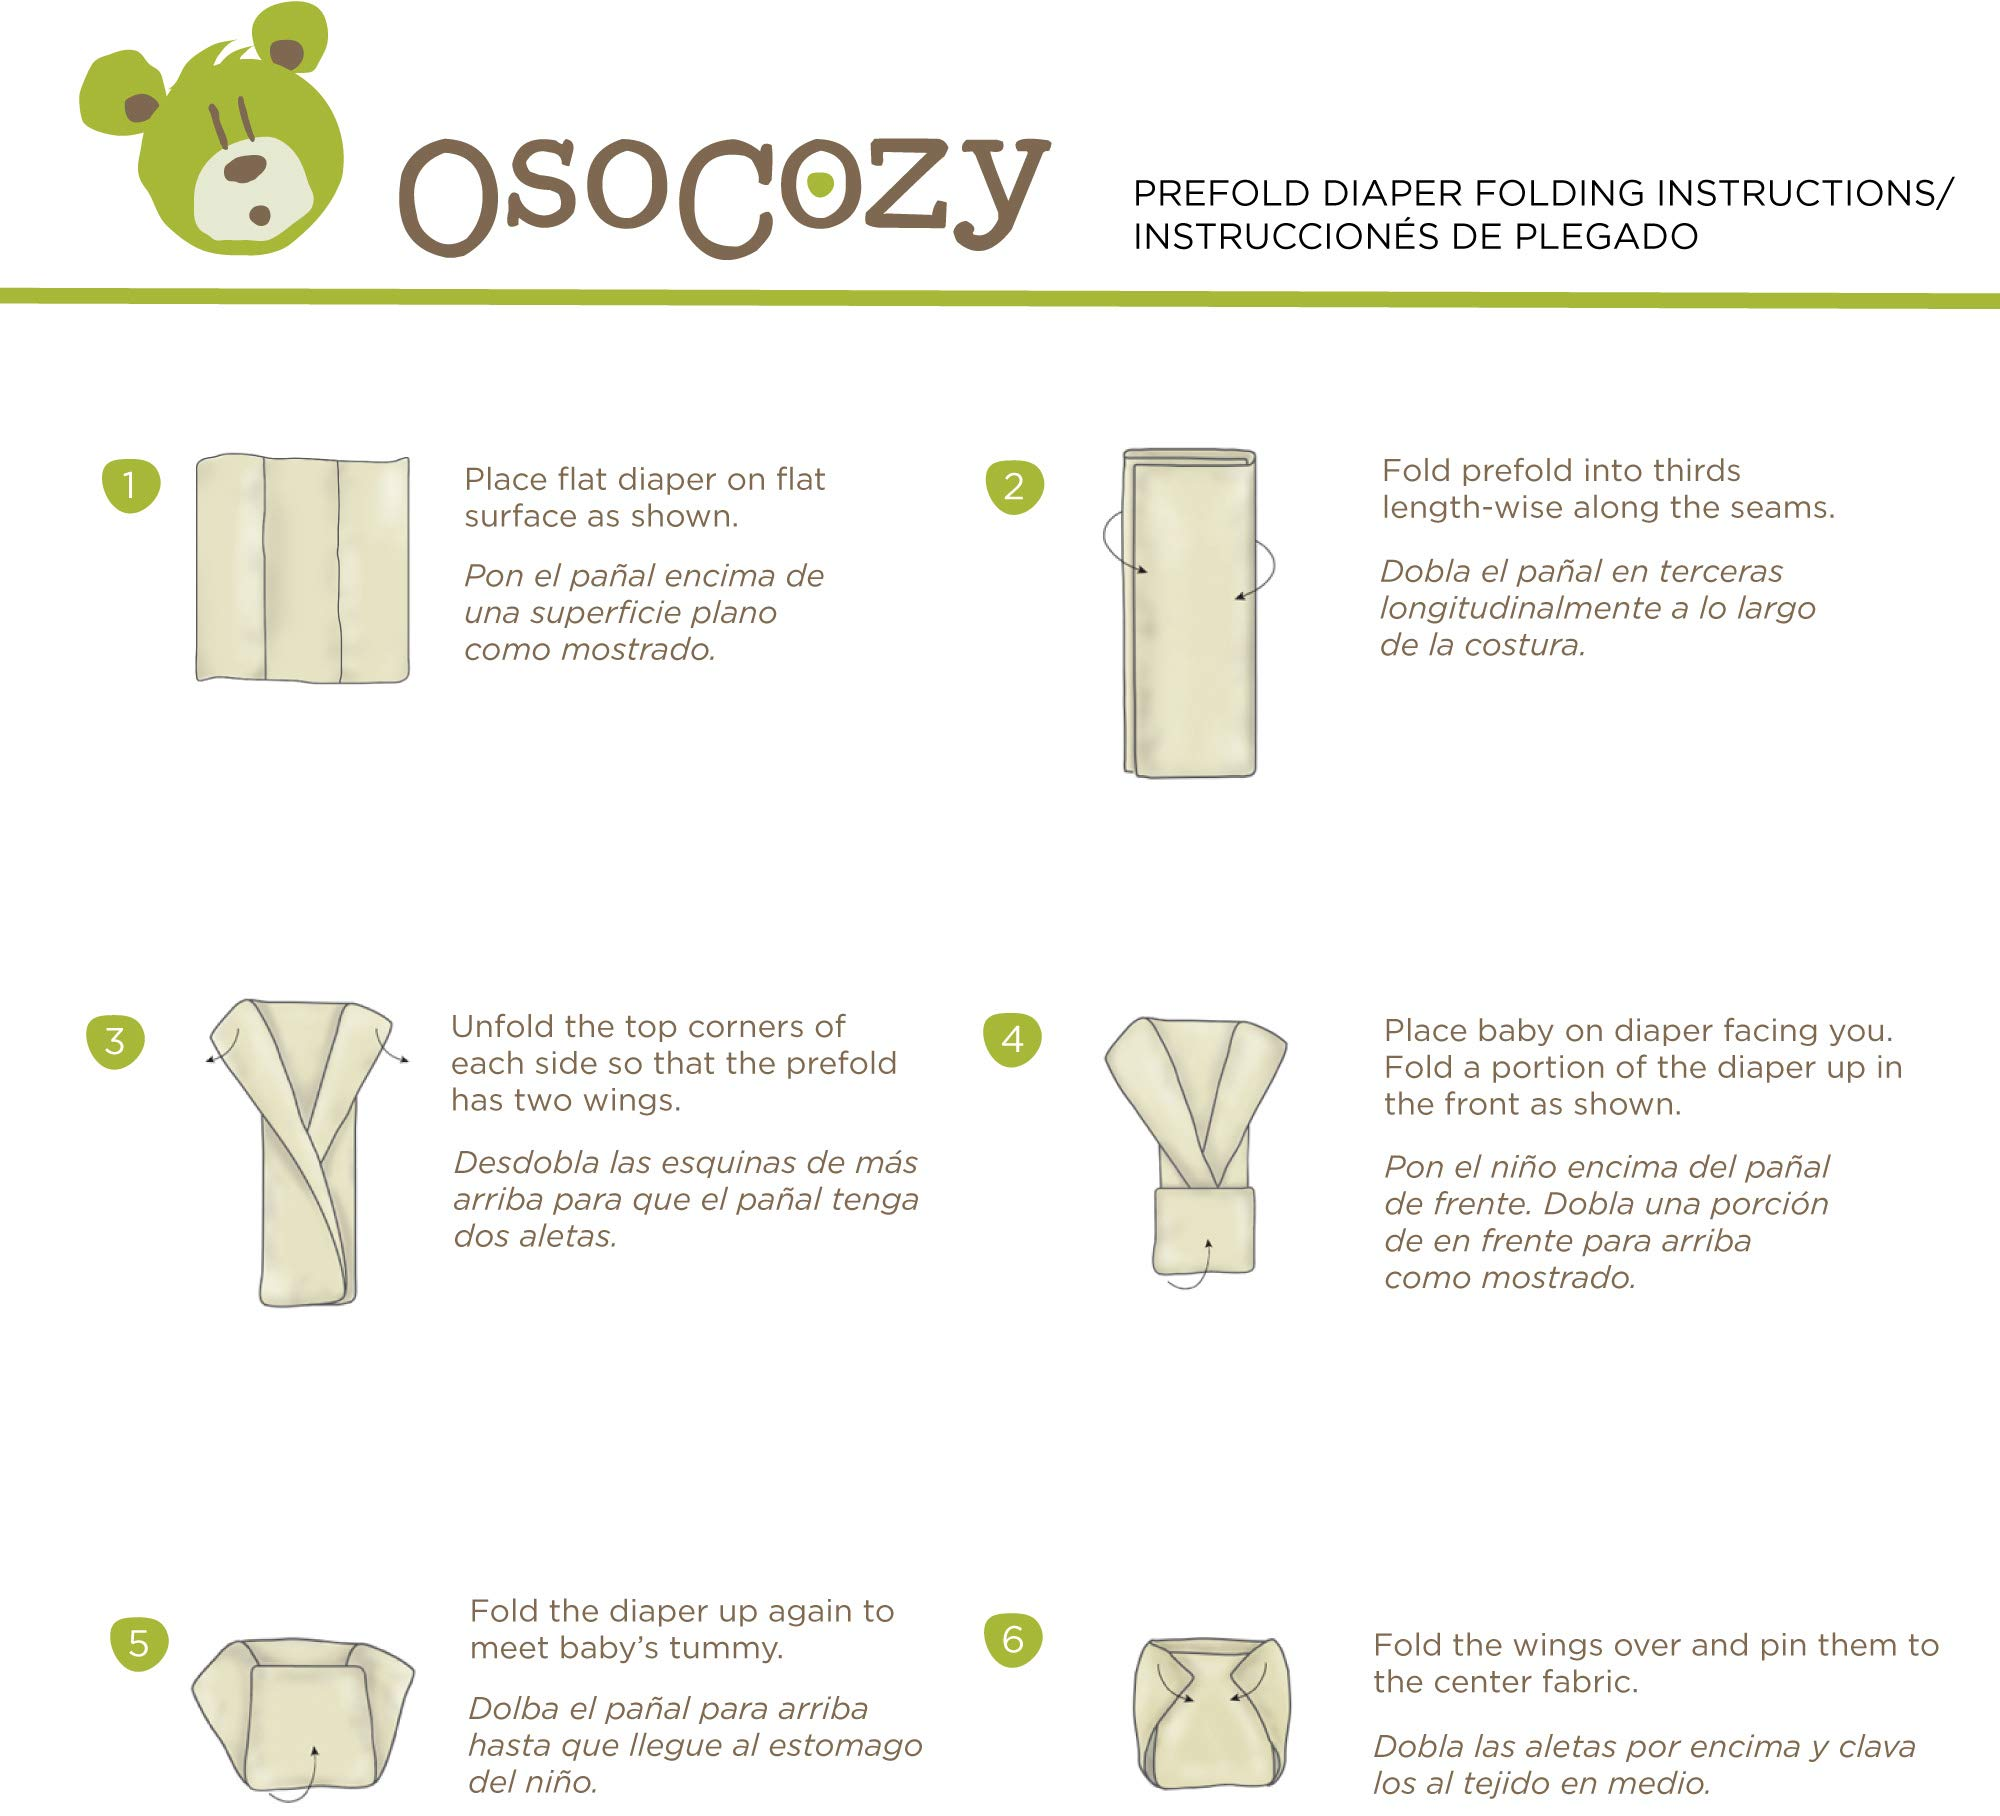 OsoCozy Unbleached Prefold Cloth Diapers - 12 Count, Newborn - 4x6x4 (6-11 lbs) by OsoCozy